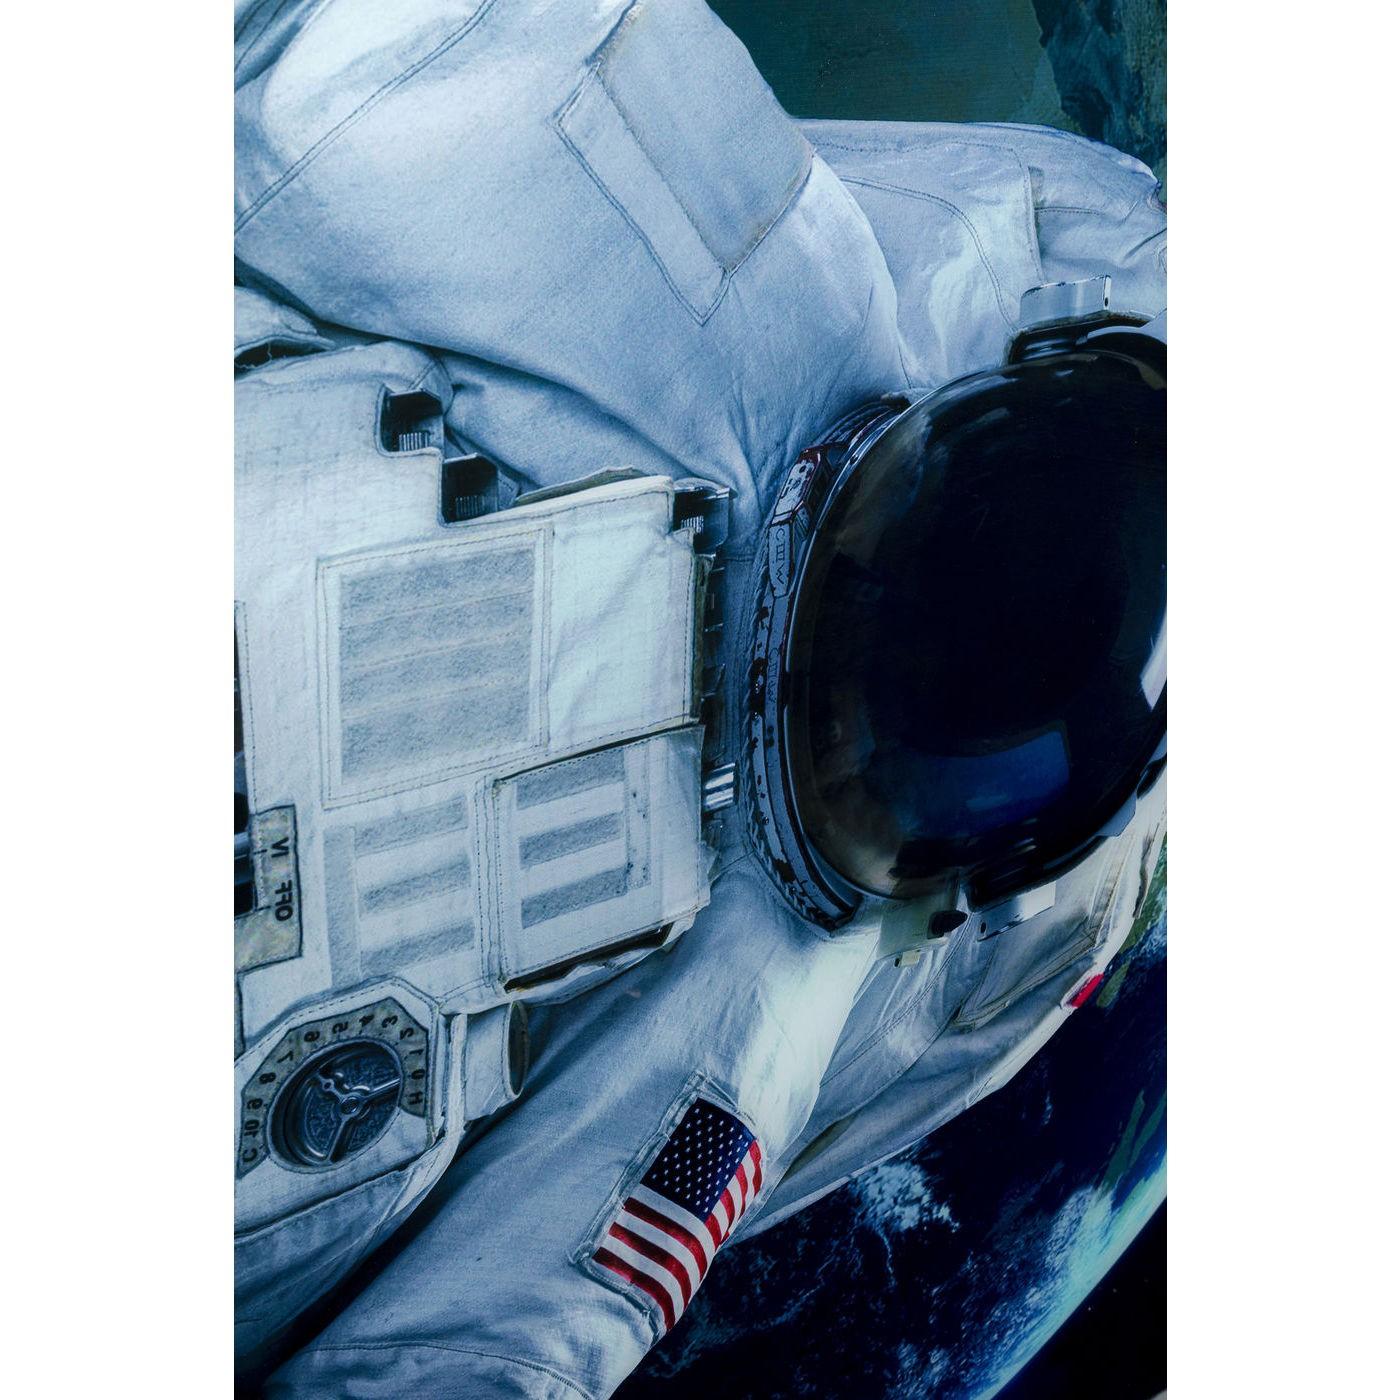 Tableau en verre Astronaute américain 120x180cm Kare Design